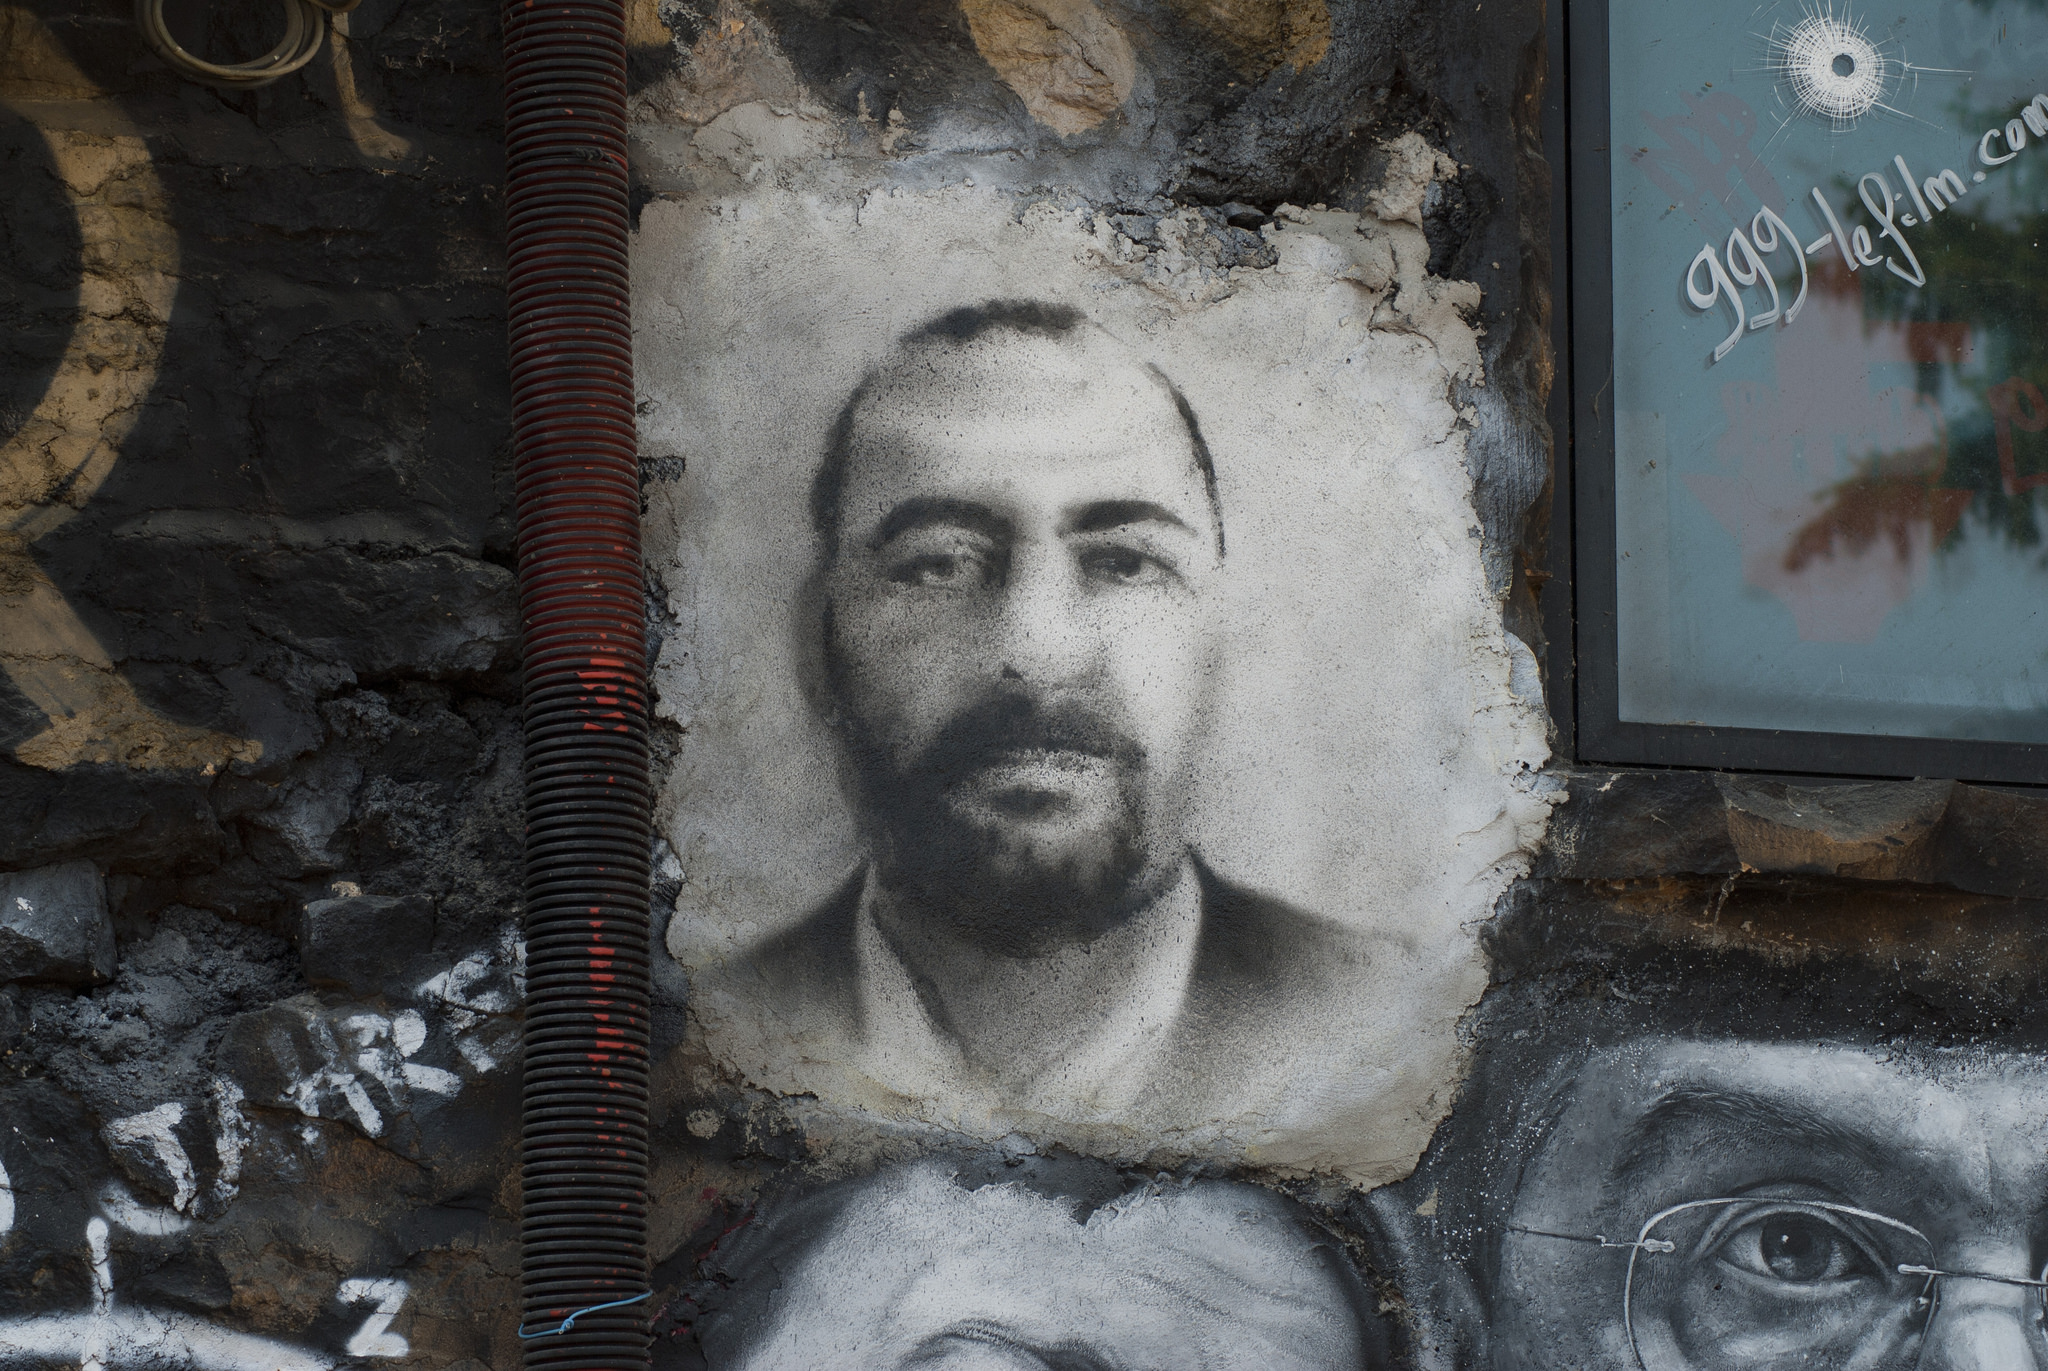 T_Thierry_Ehrmann_Abu_Bakr_al_Baghdadi_painted_portrait